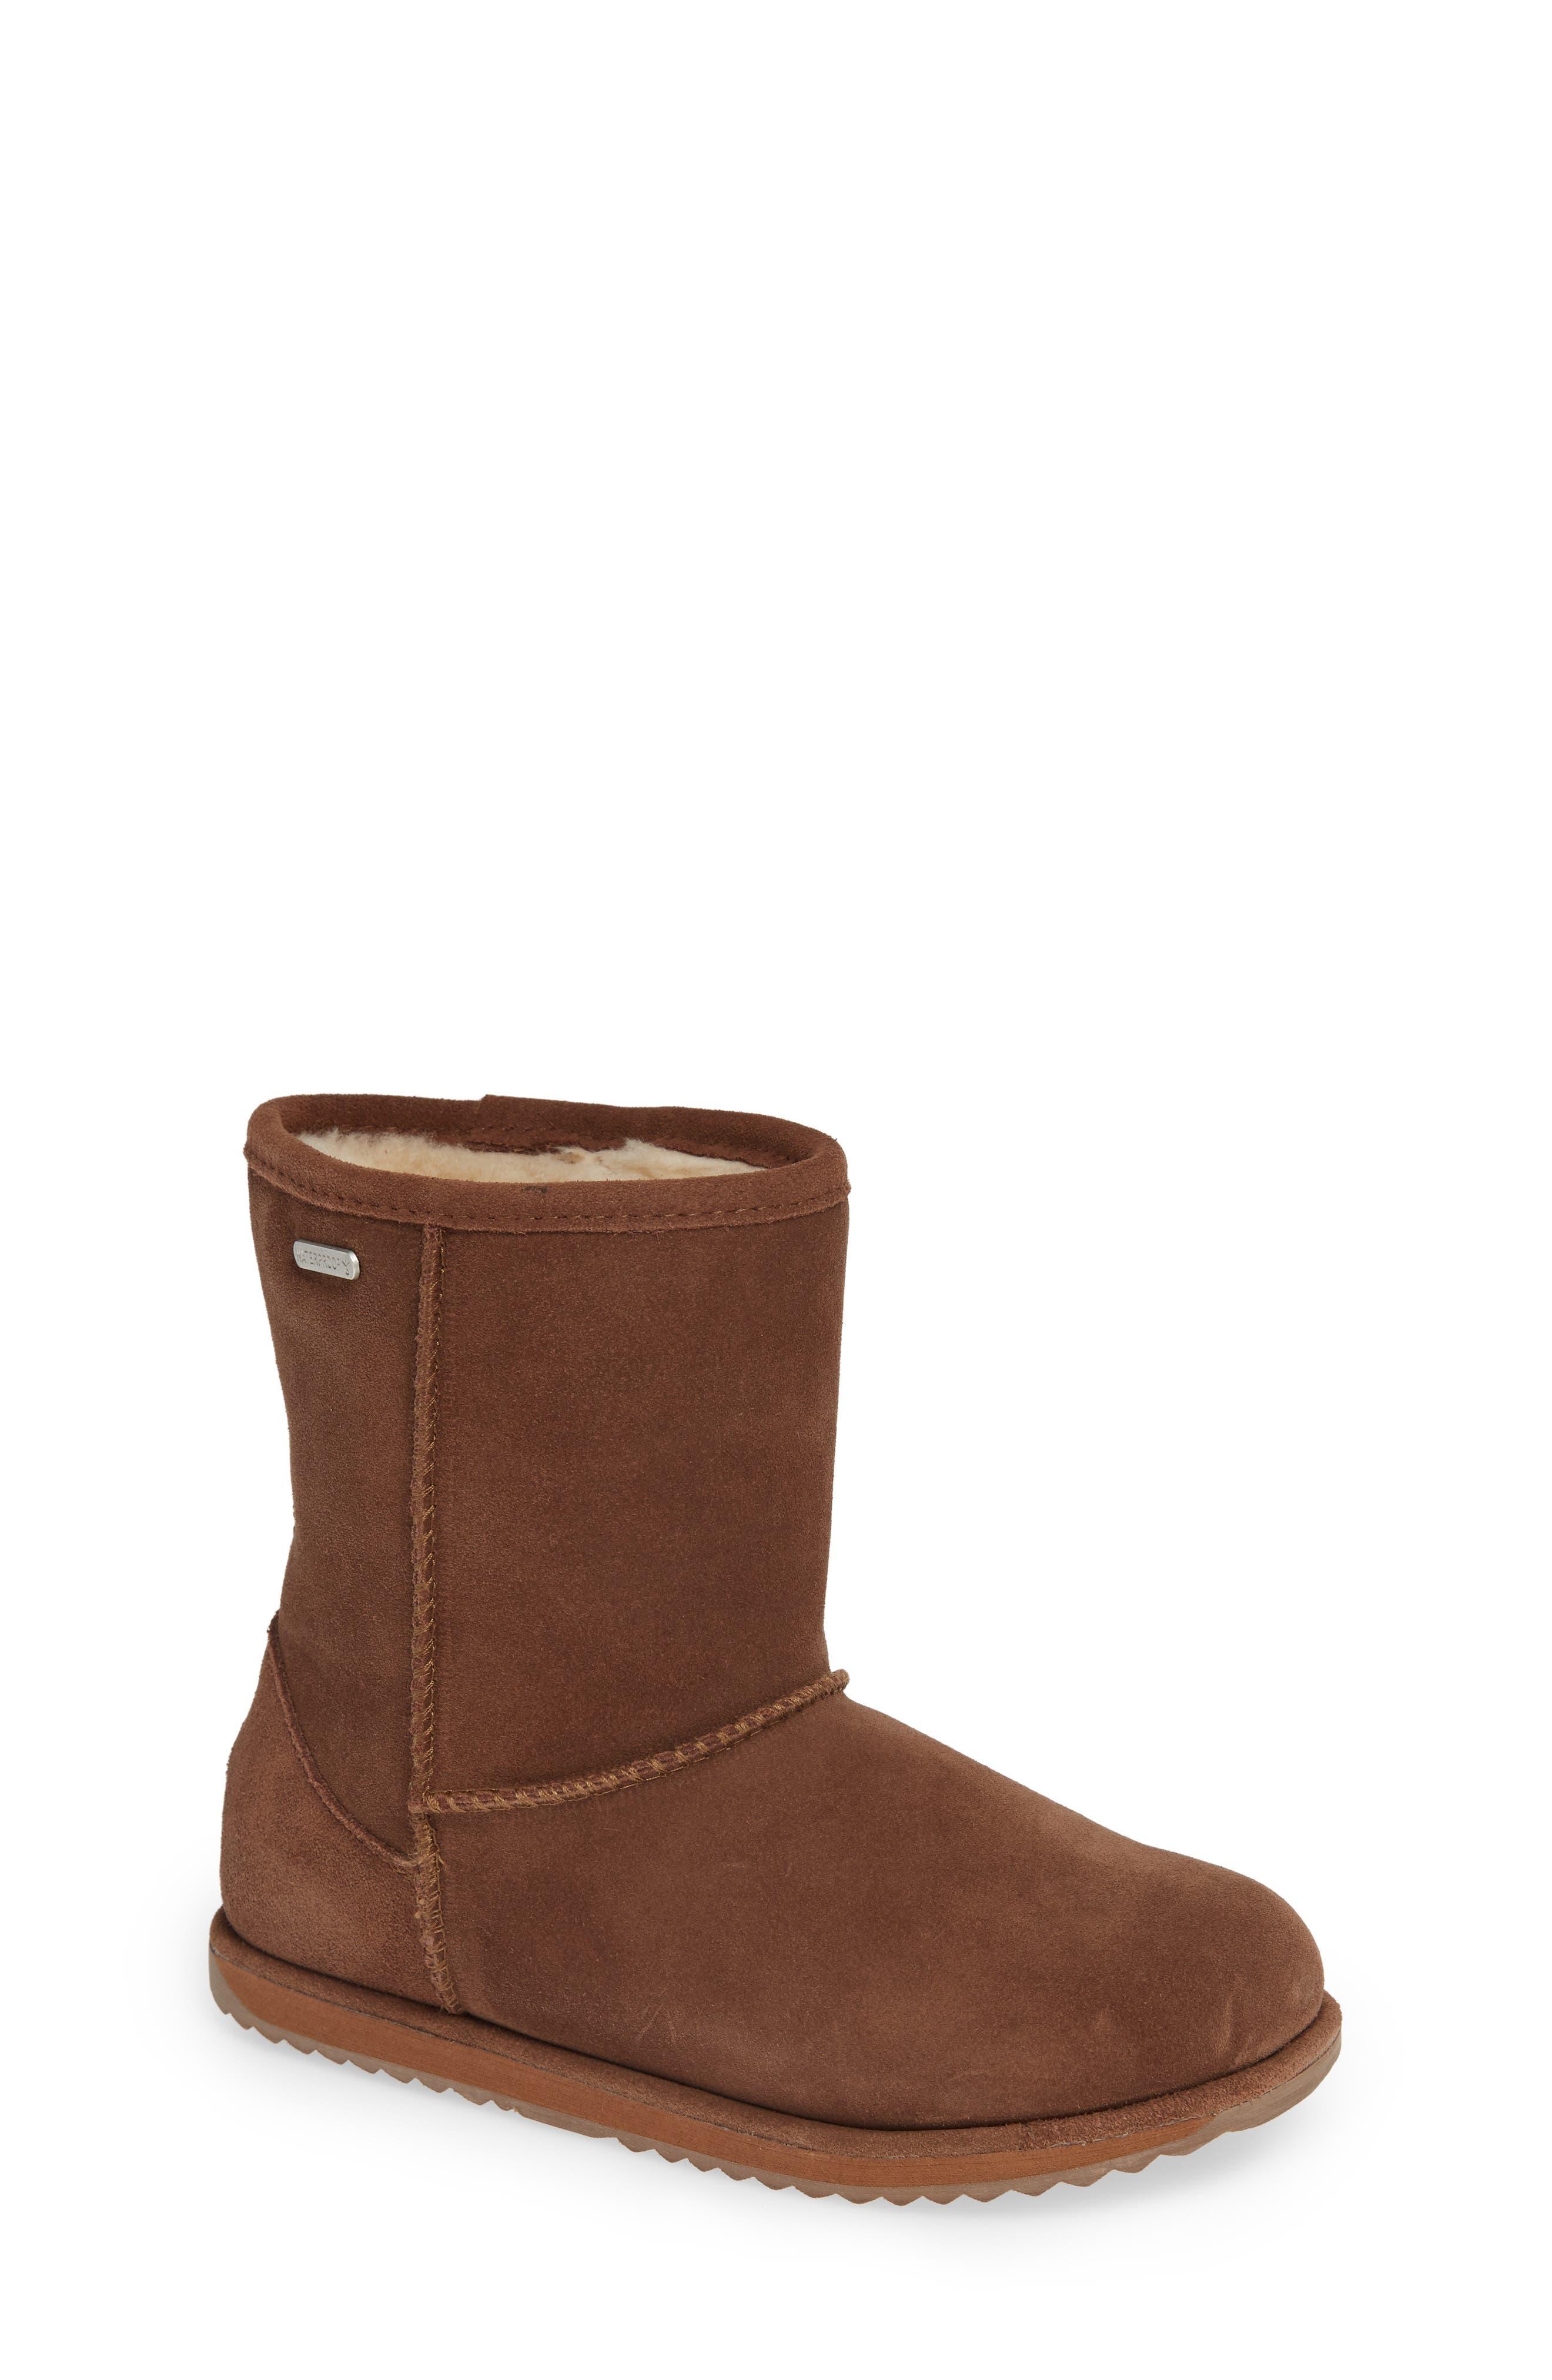 Brumby Waterproof Boot,                         Main,                         color, Oak Brown